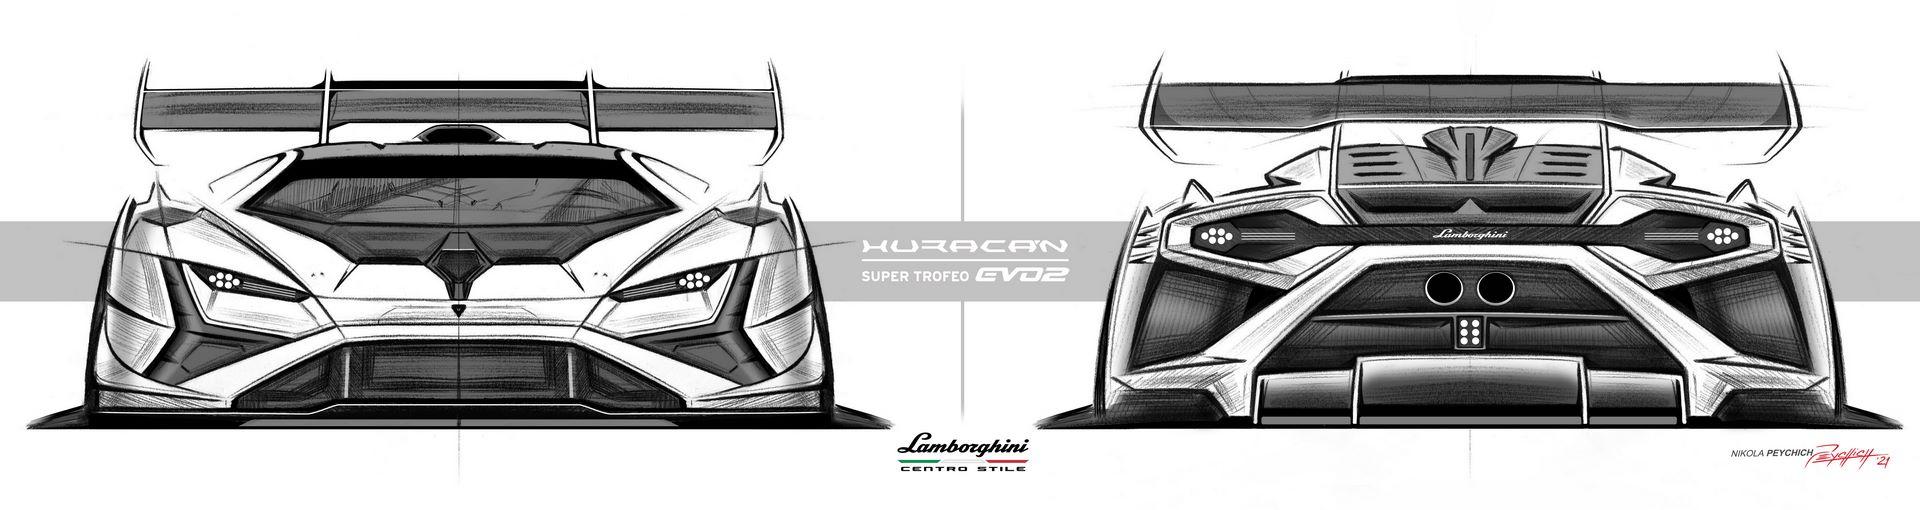 Lamborghini-Huracan-Super-Trofeo-EVO2-22